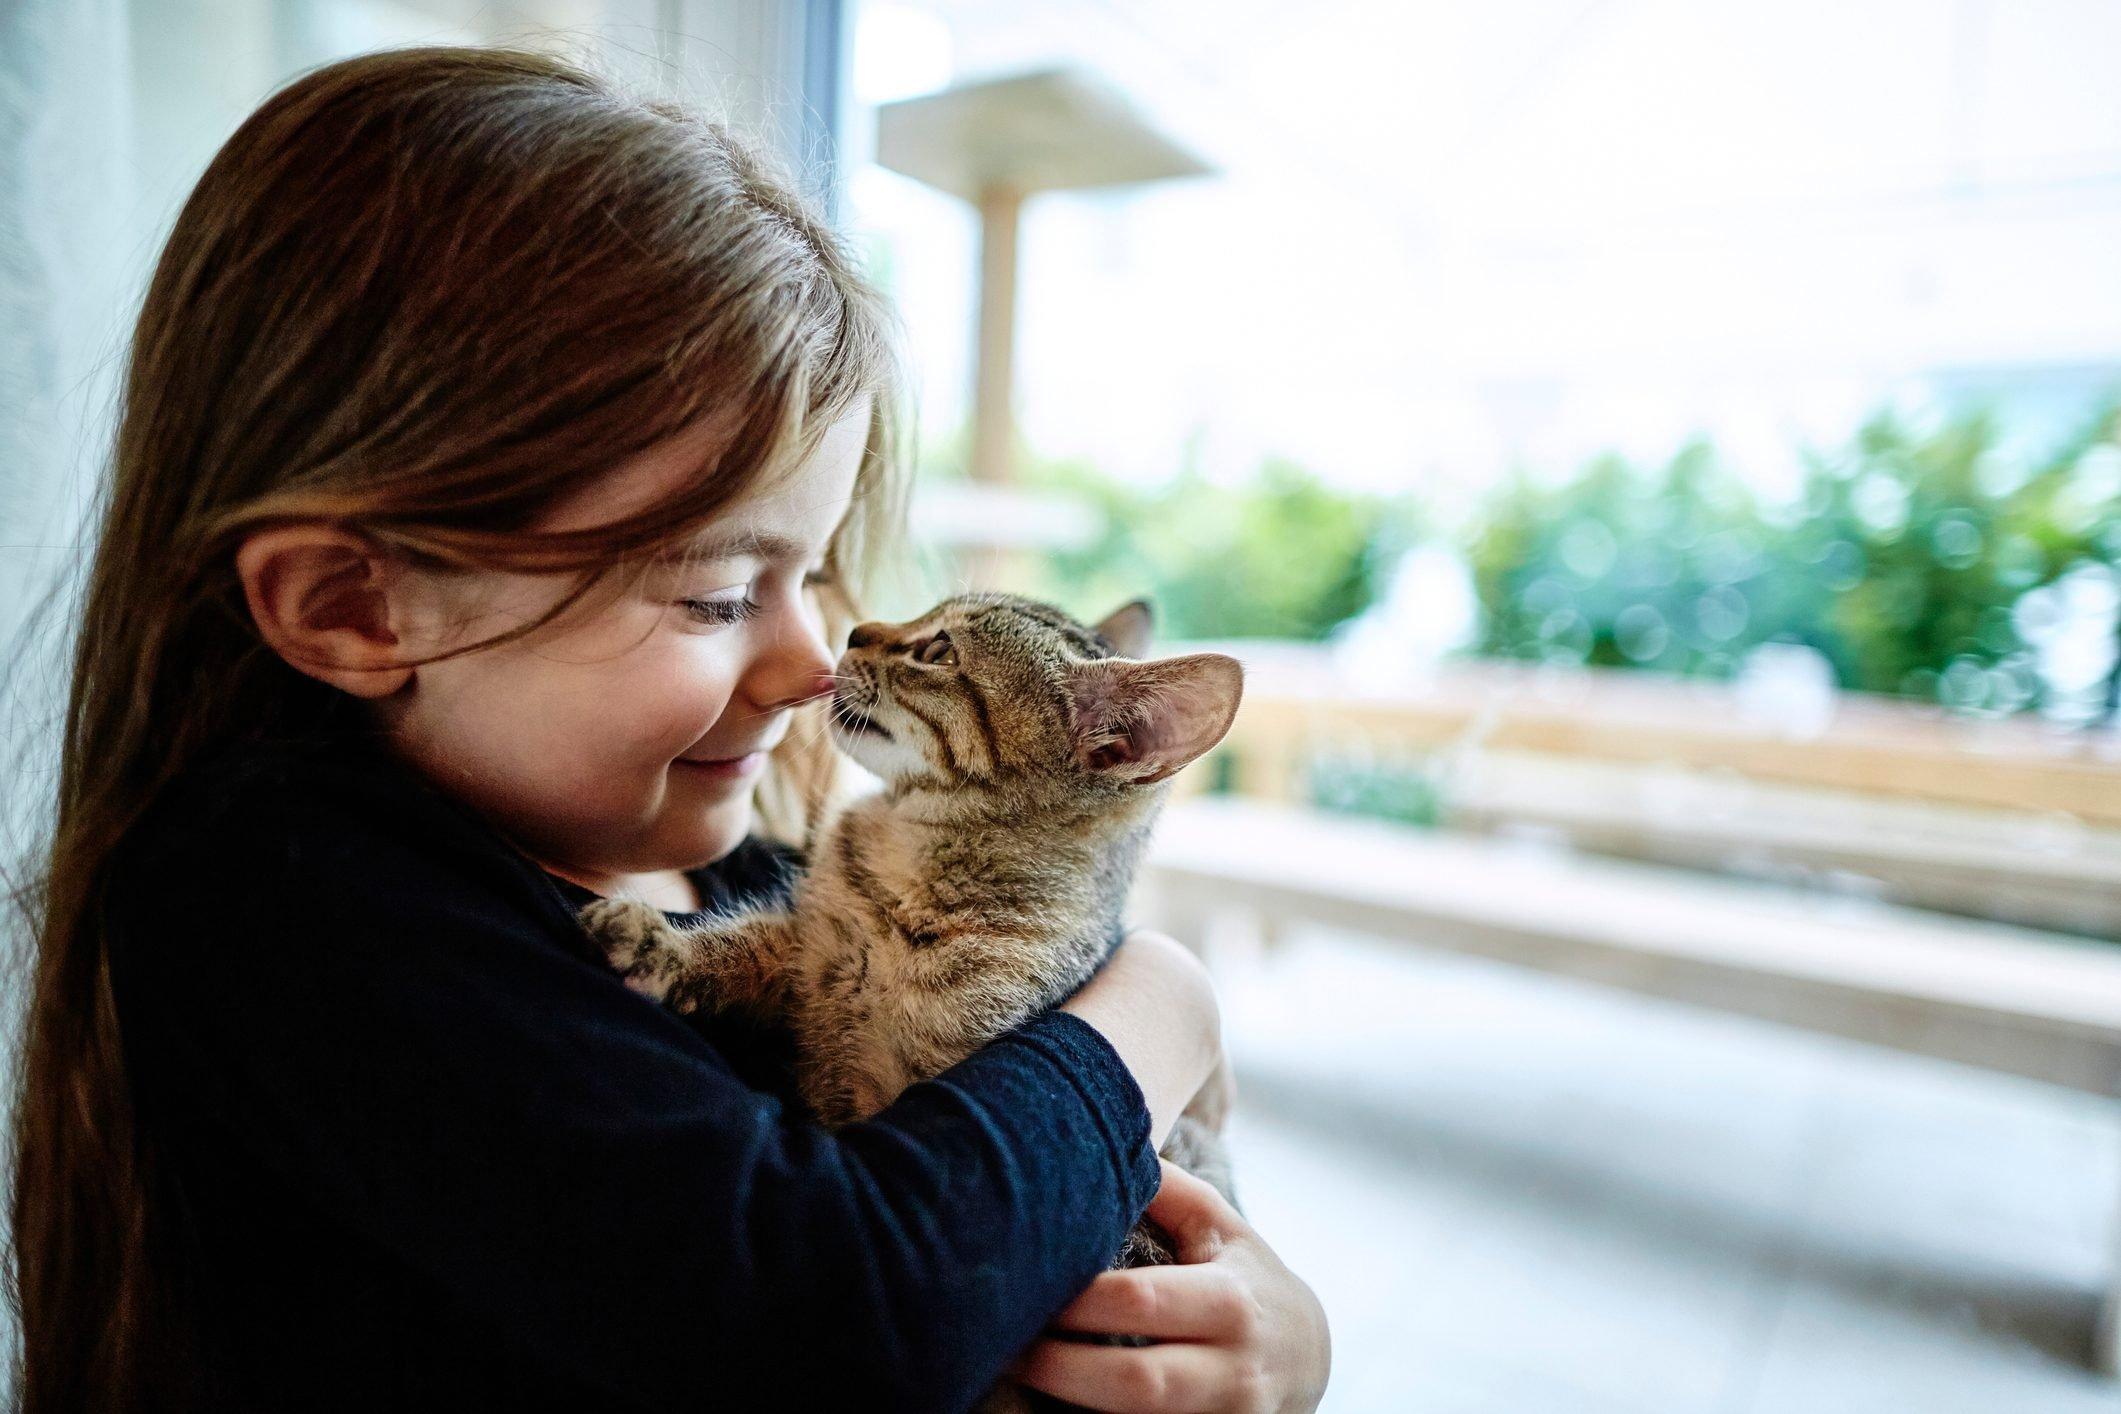 Cute girl holding kitten at the window